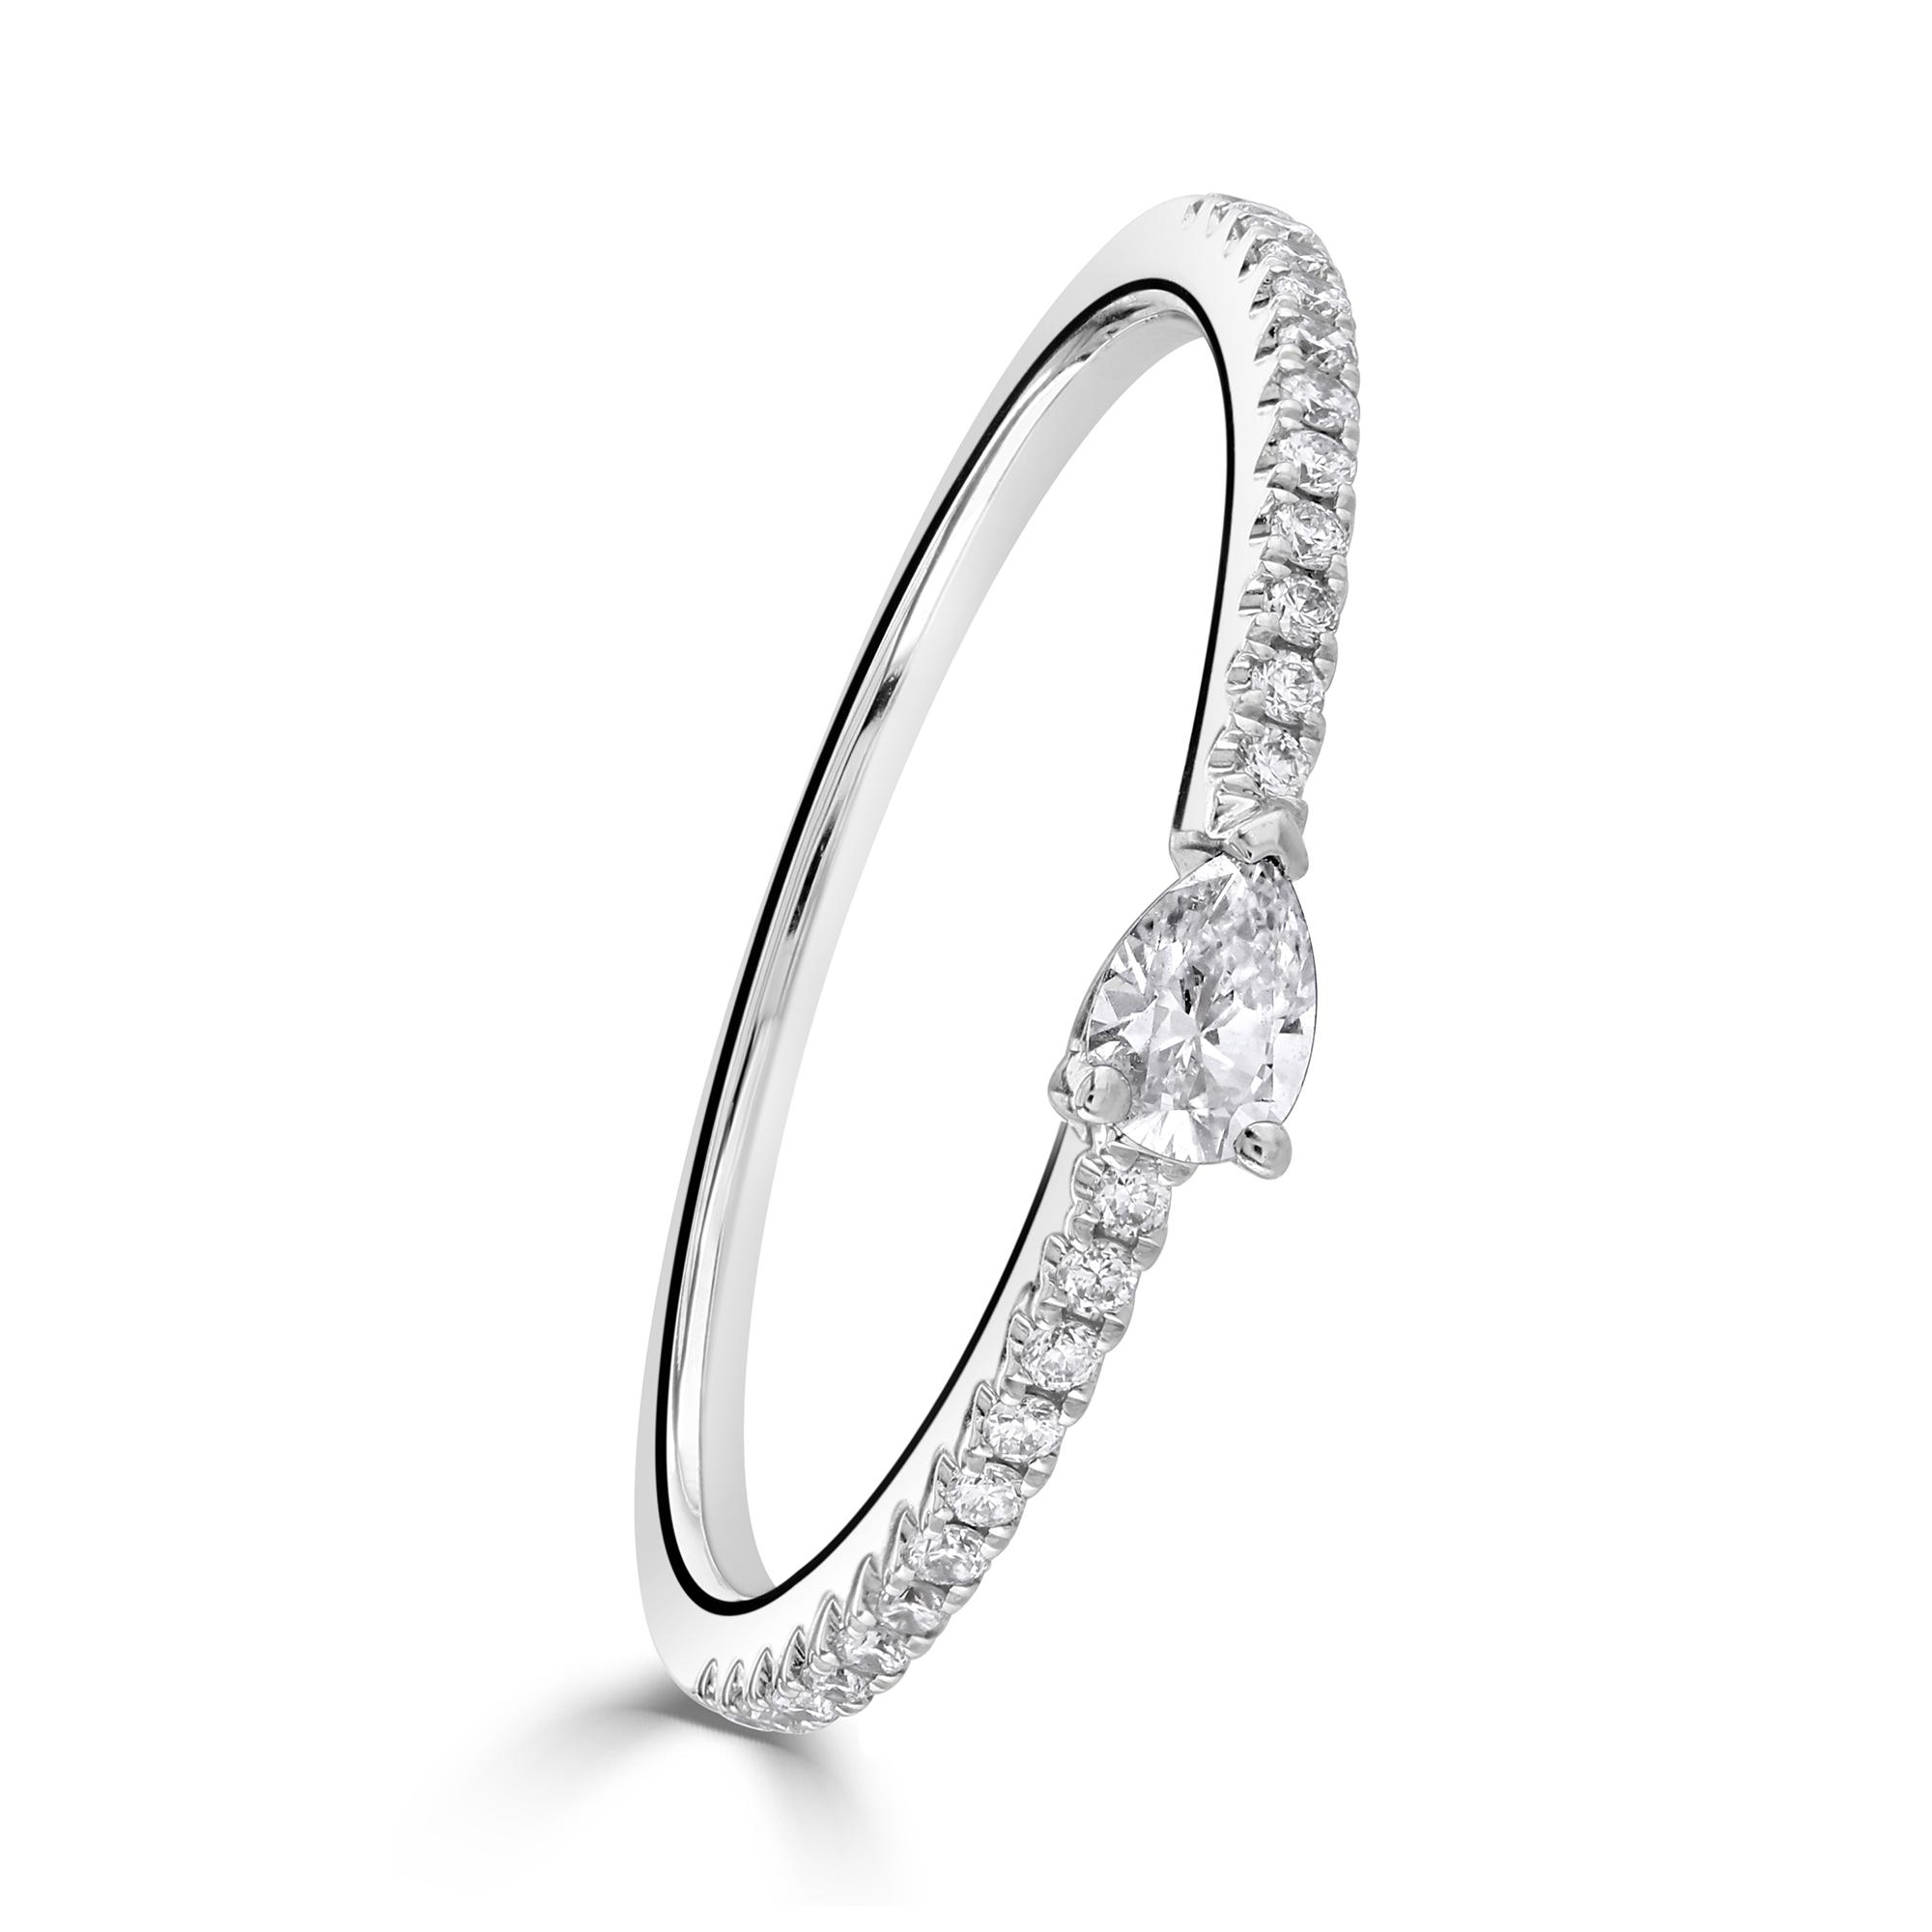 Pear Cut White Gold Diamond Stacking Ring